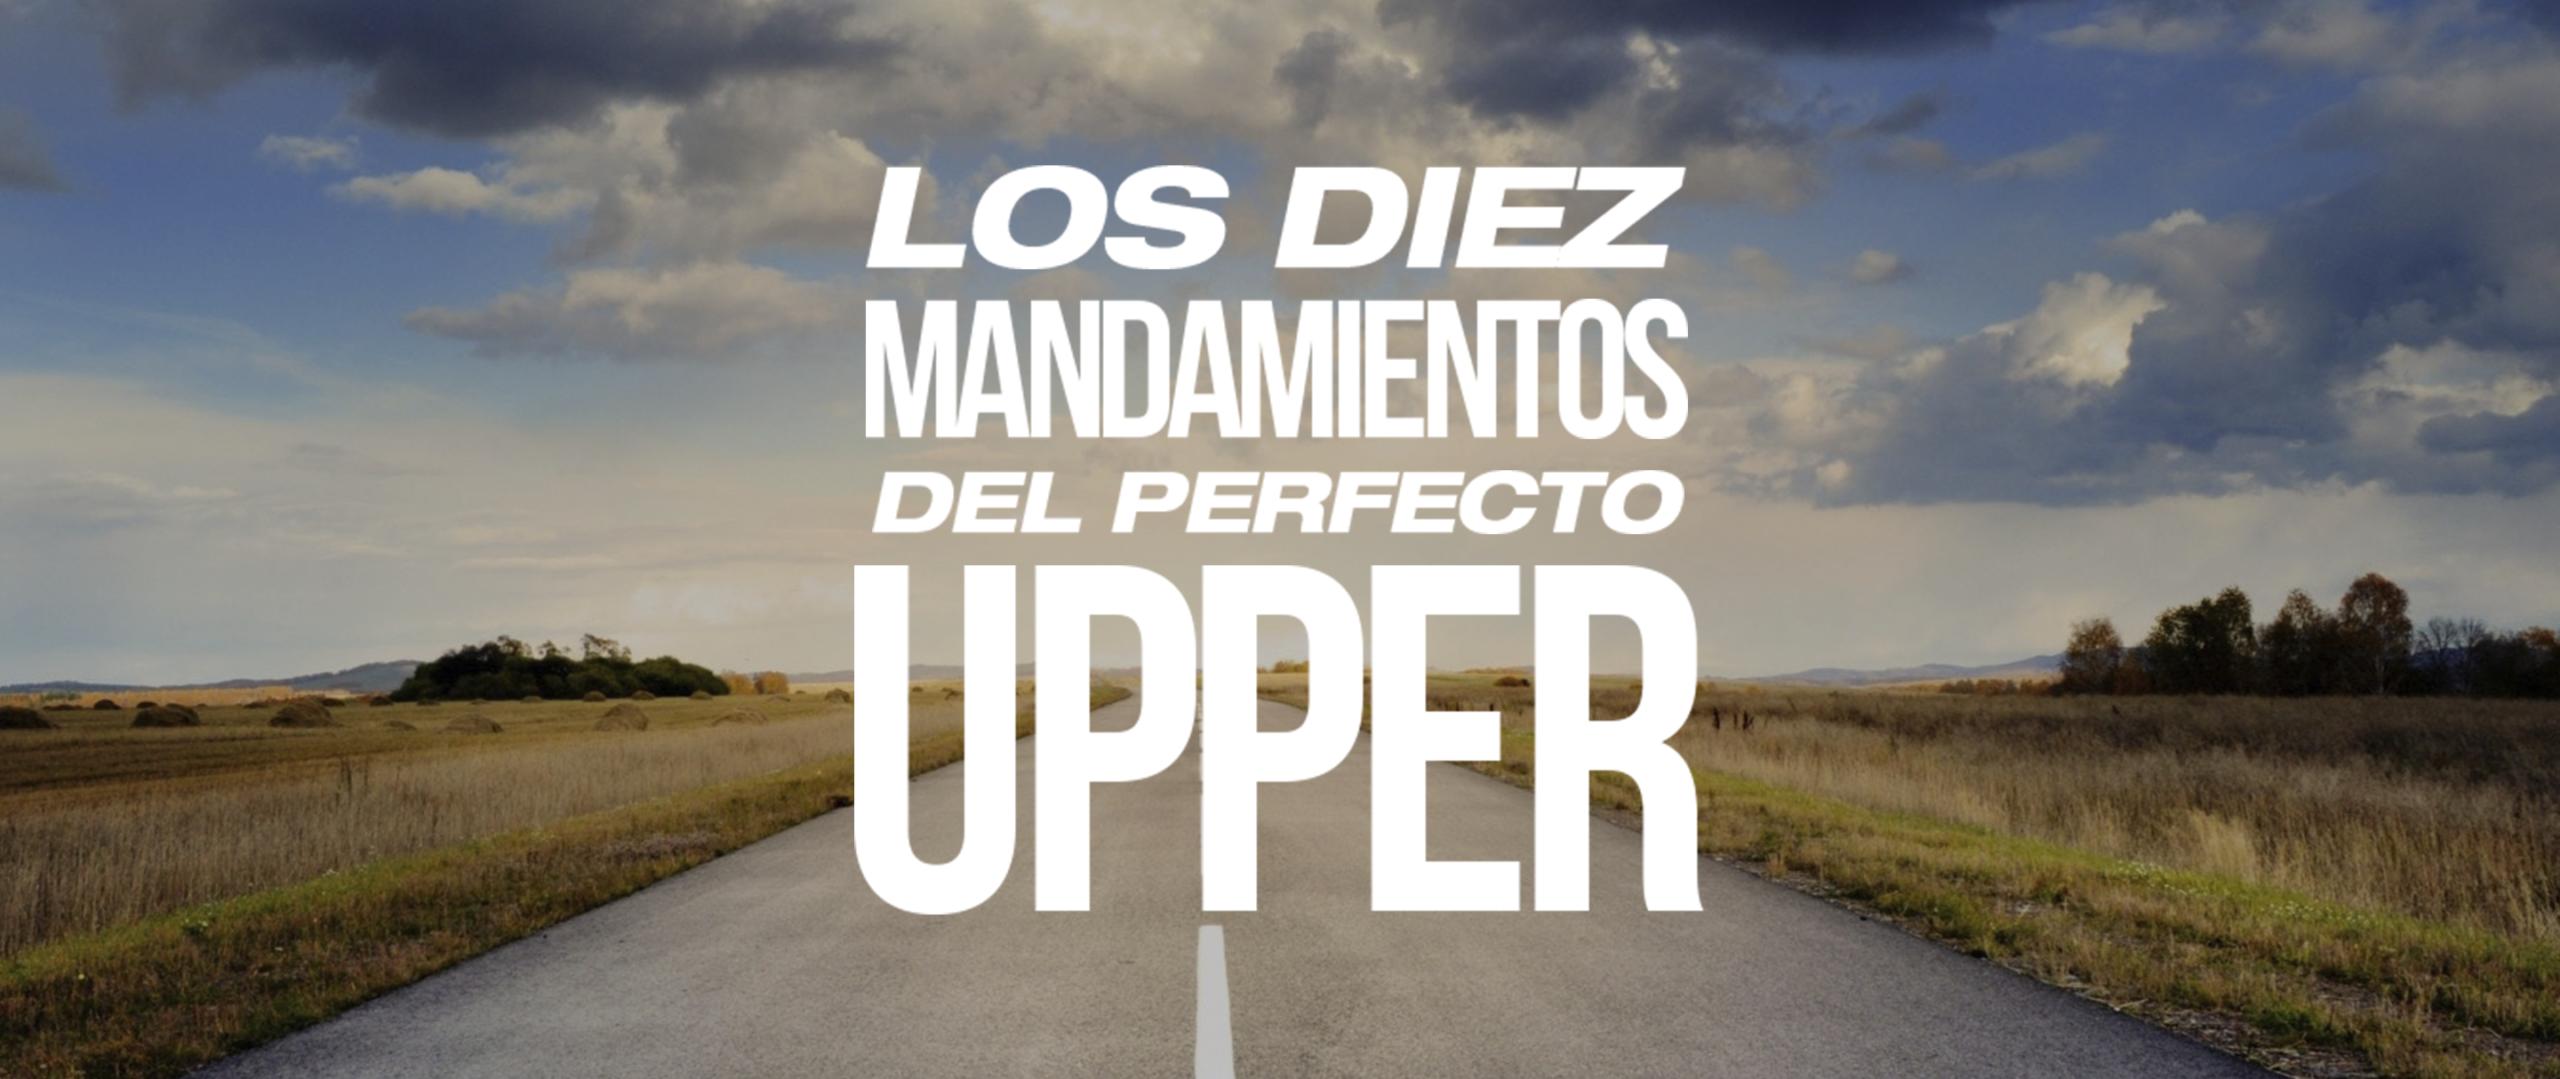 https://megamedia.es/wp-content/uploads/2019/10/foto_interior_10mandamientos.png